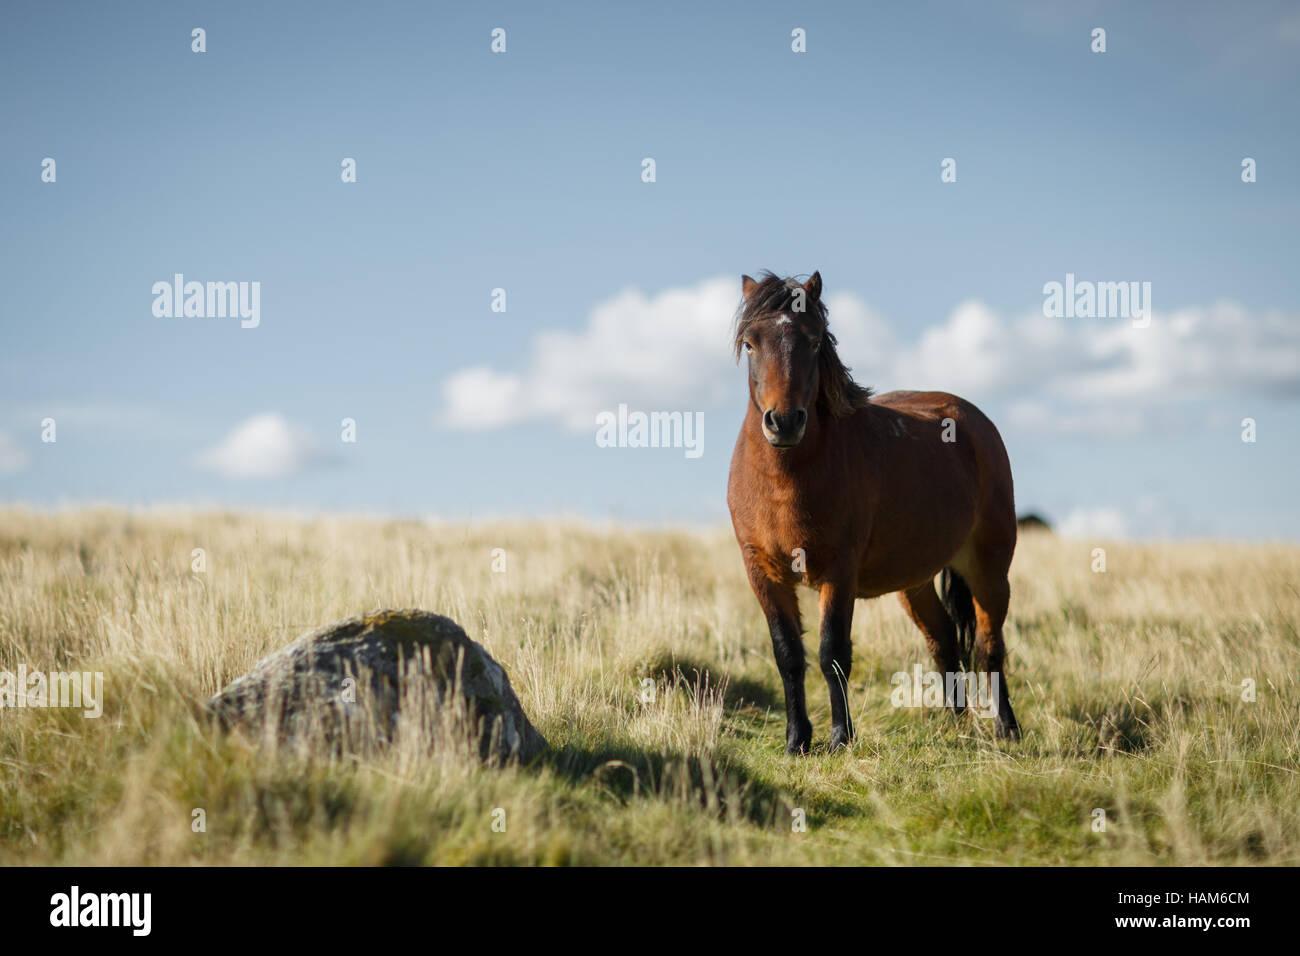 Dartmoor pony in a grassy field - Stock Image